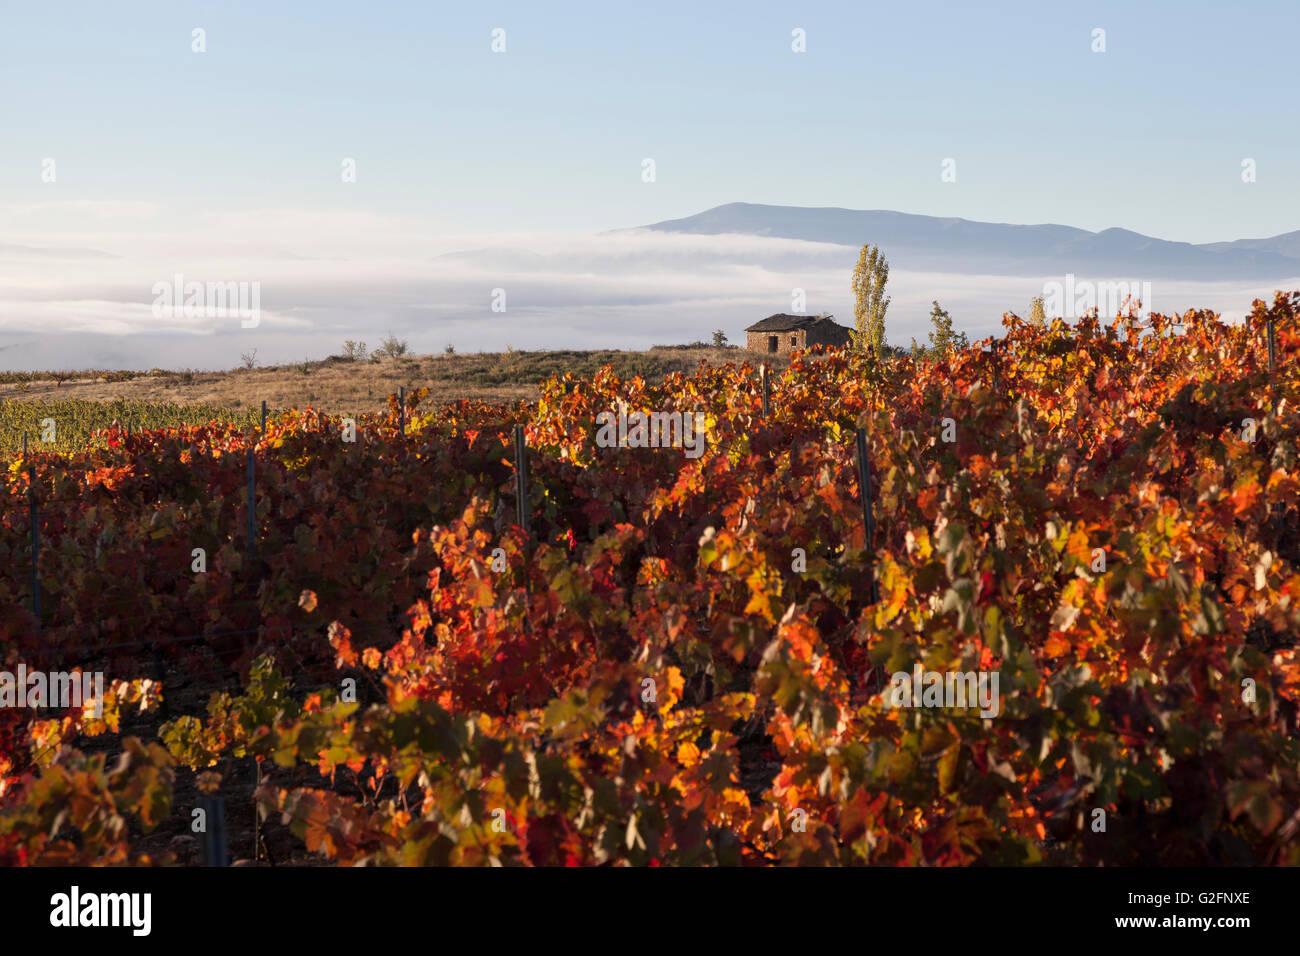 Villafranca del Bierzo, Spain: Vineyards with a rustic shelter along the Camino Francés. - Stock Image